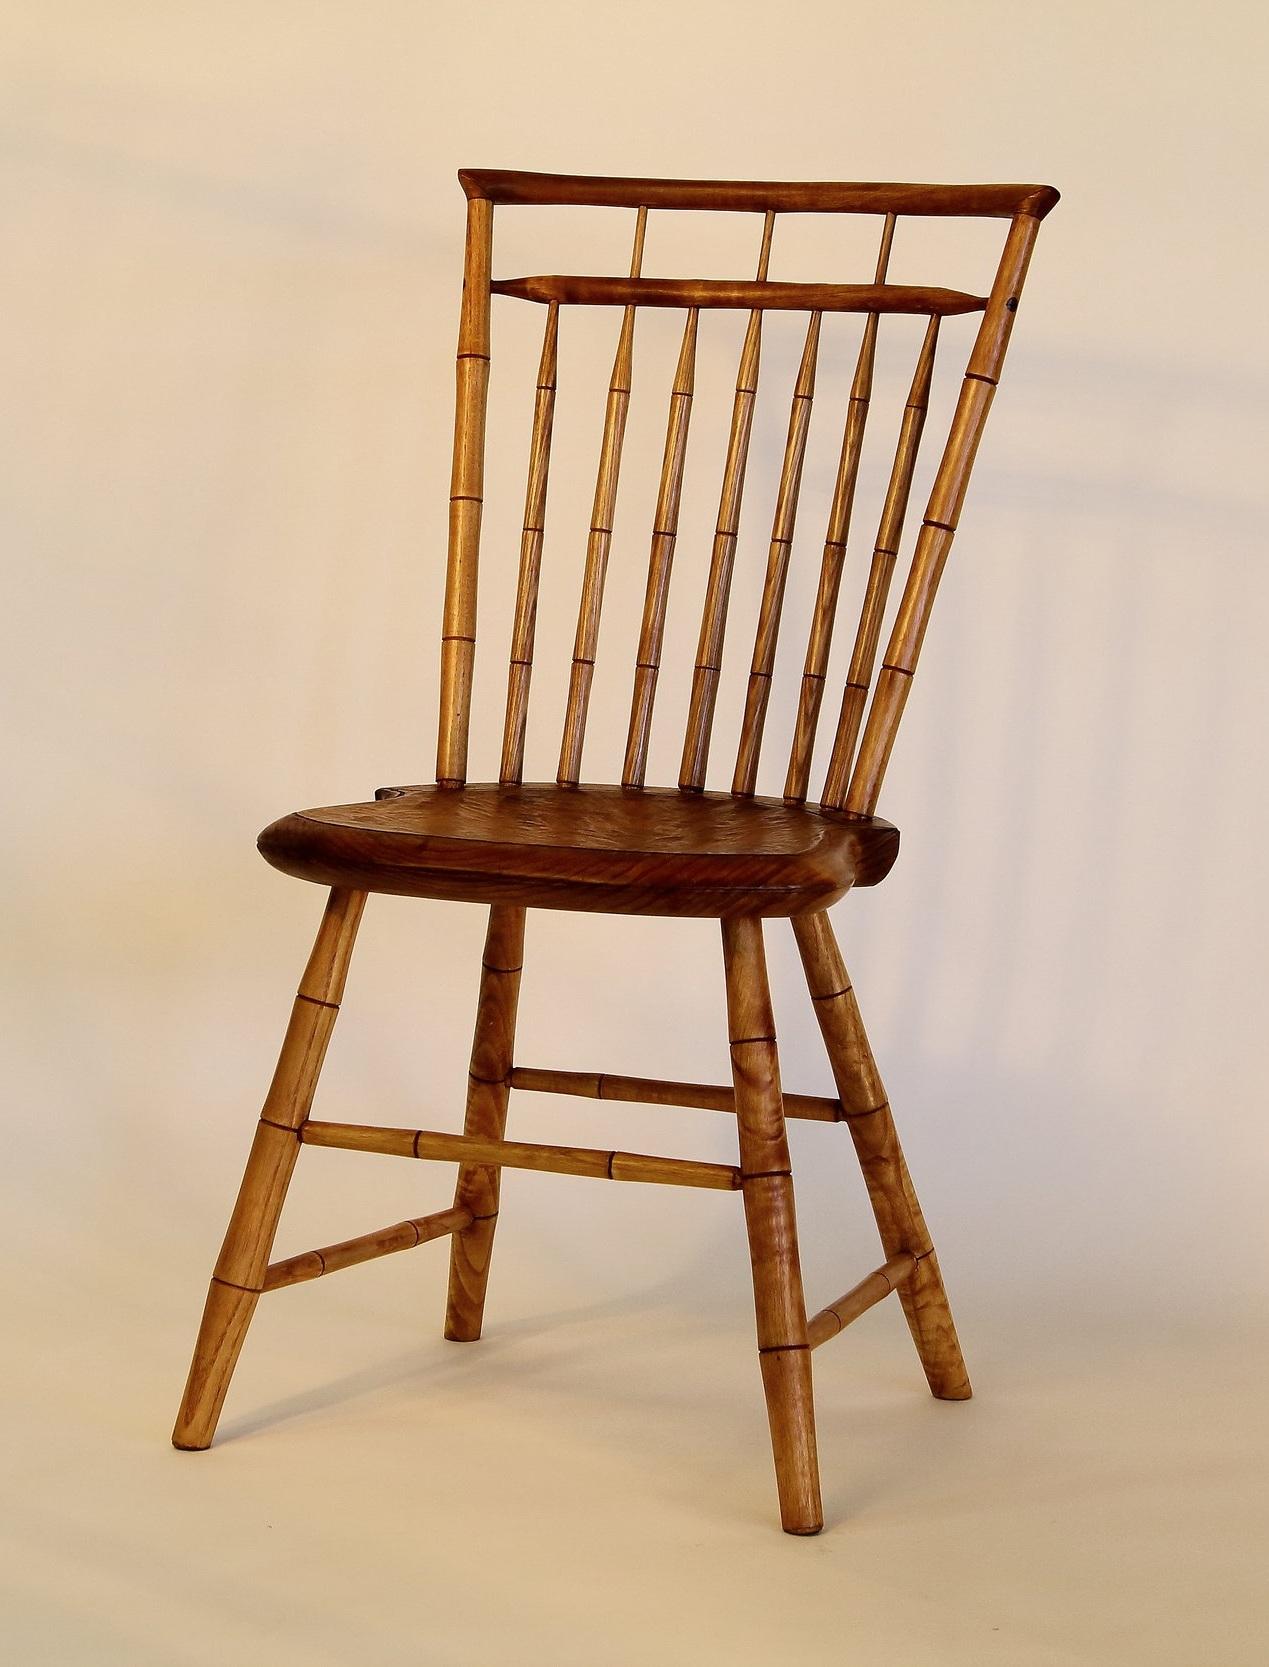 Double Rodback Windsor Chair